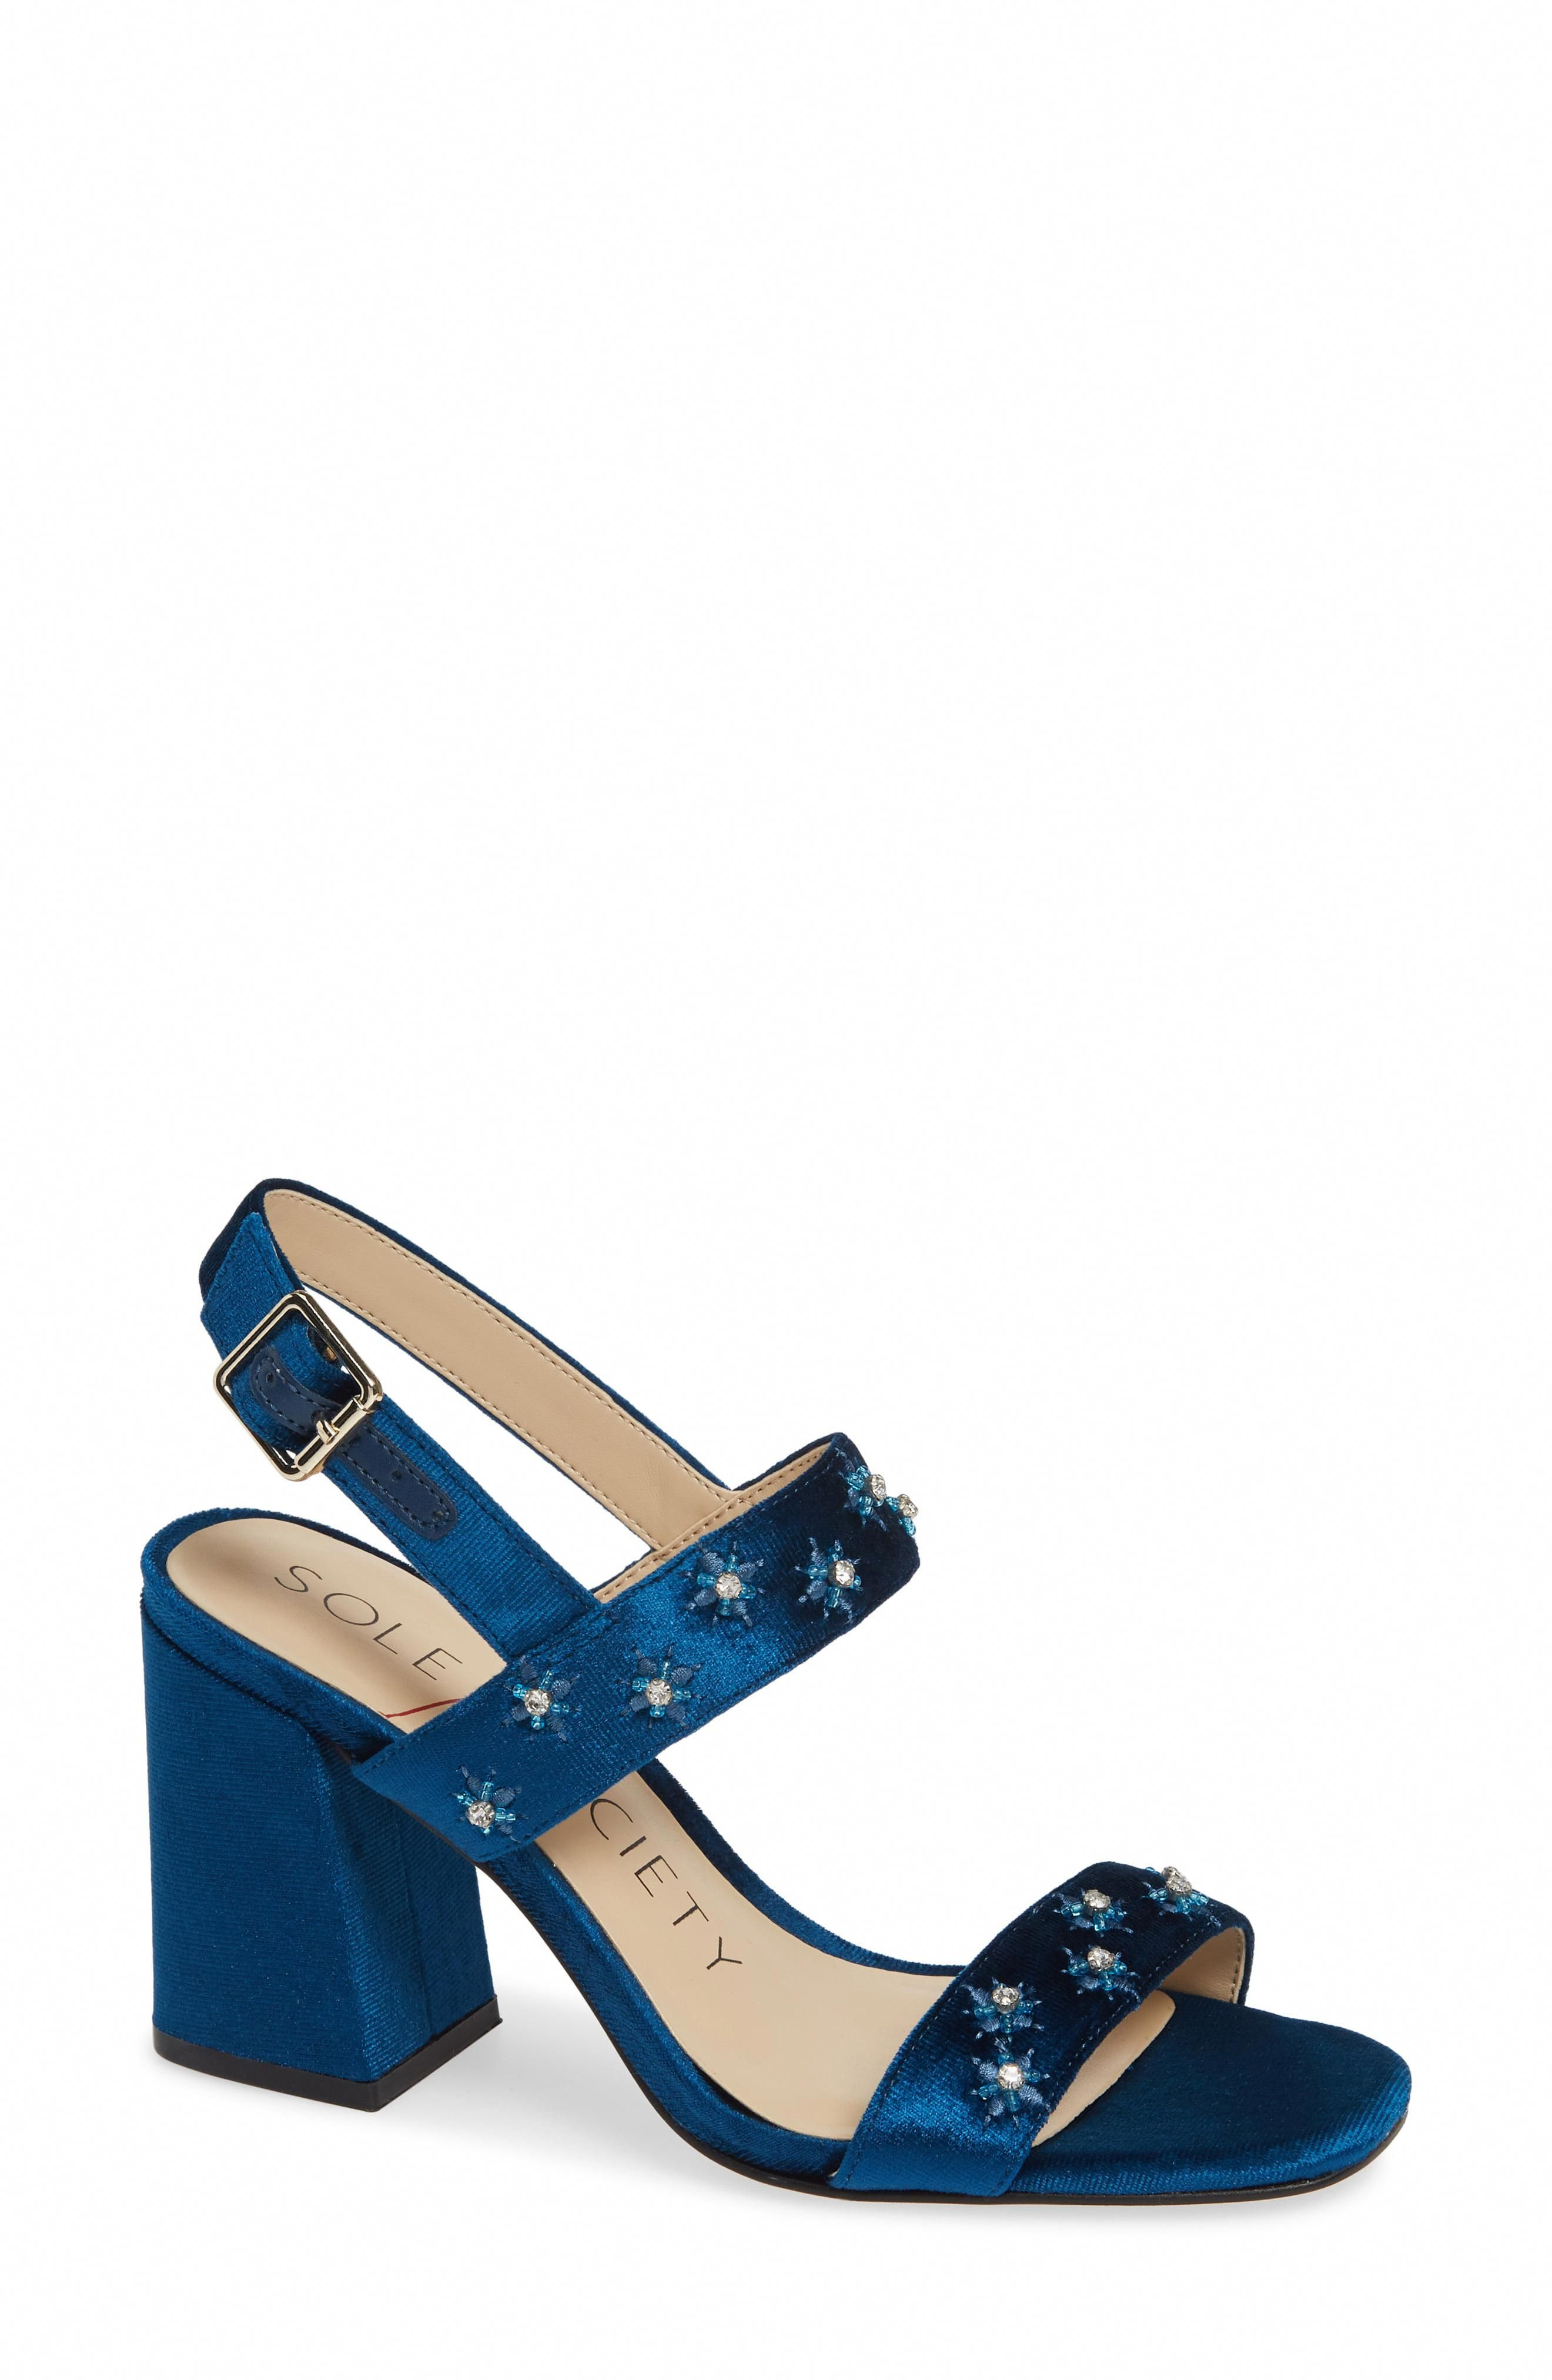 Big 5 Women S Shoes #JJillWomenSShoes